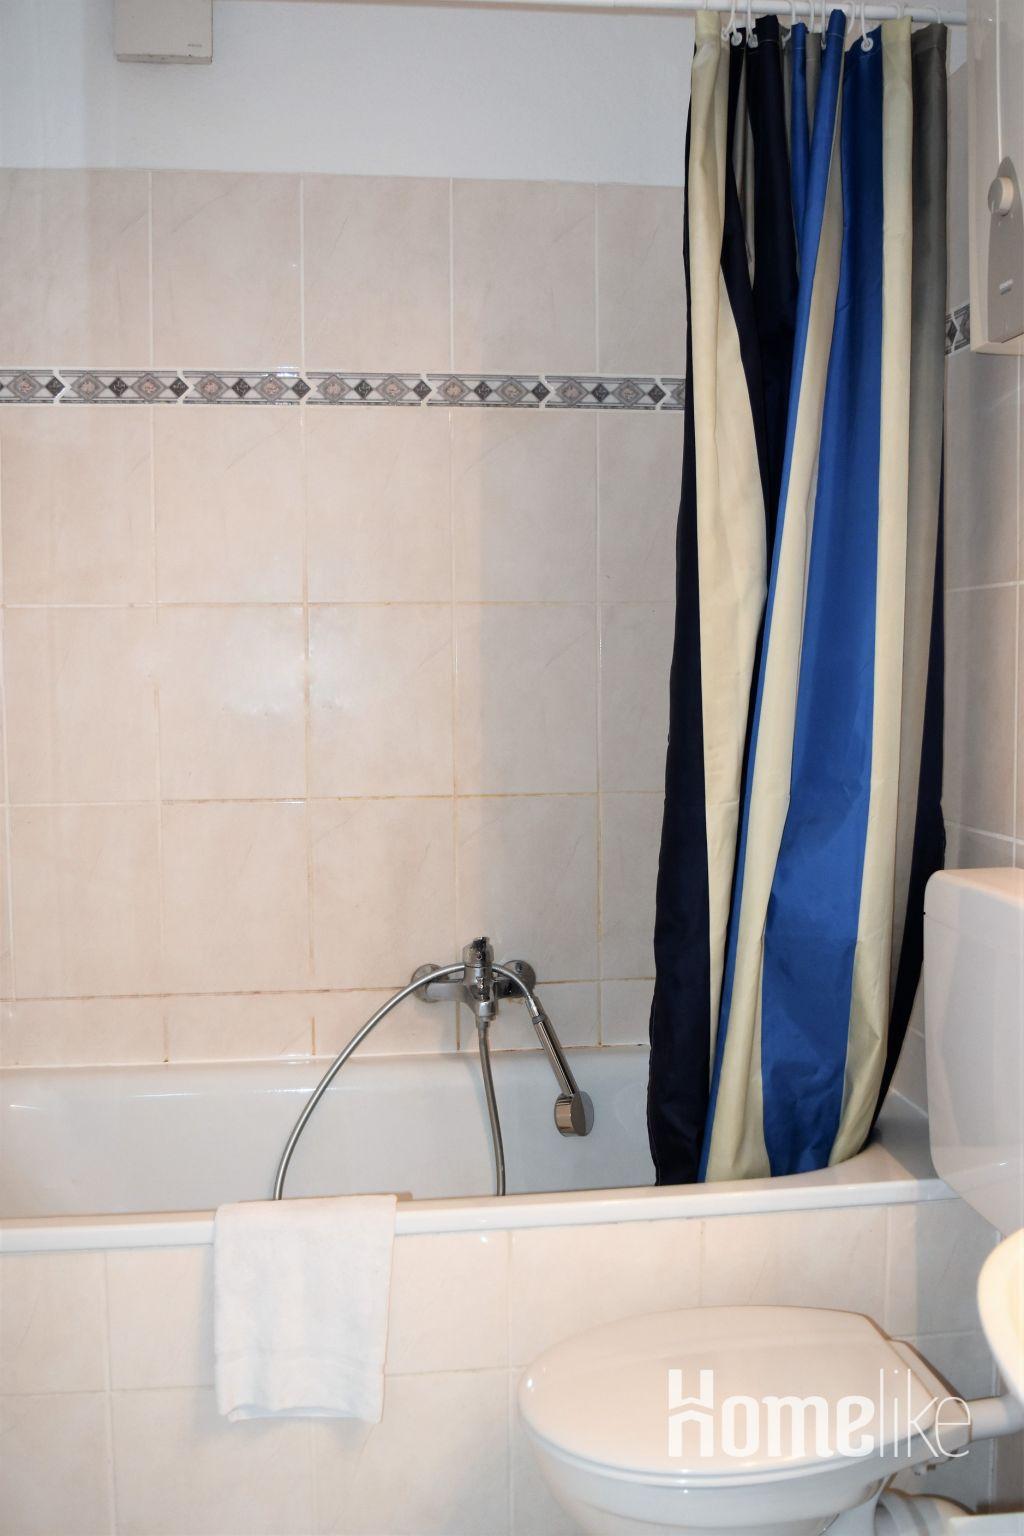 image 4 furnished 2 bedroom Apartment for rent in Neuss, Rhein-Kreis Neuss